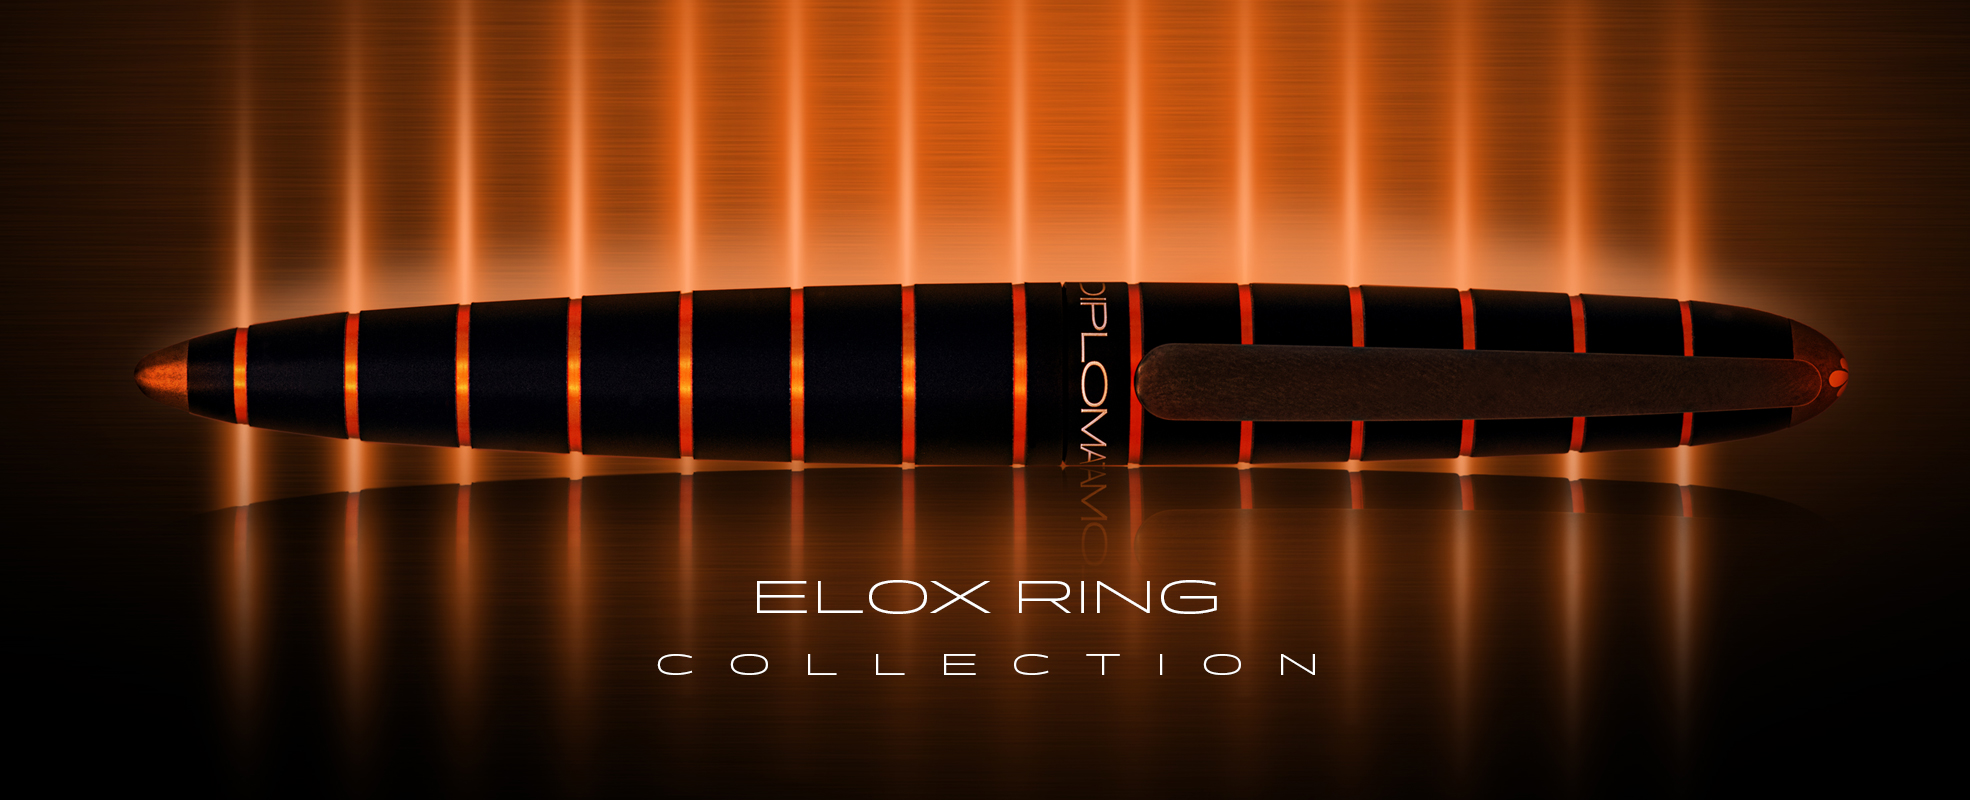 elox-ring-banner.jpg